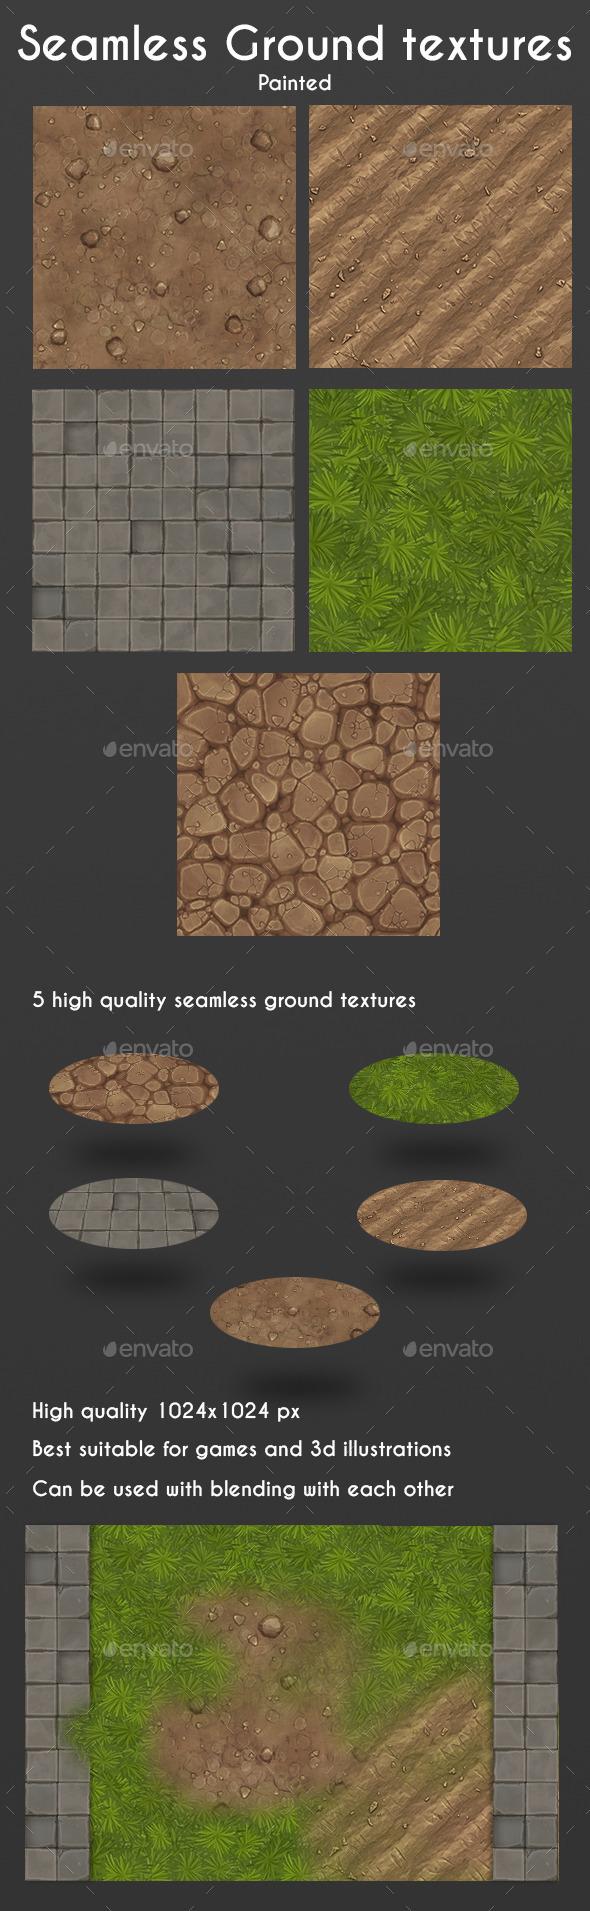 GraphicRiver Seamless Ground Textures 11166658